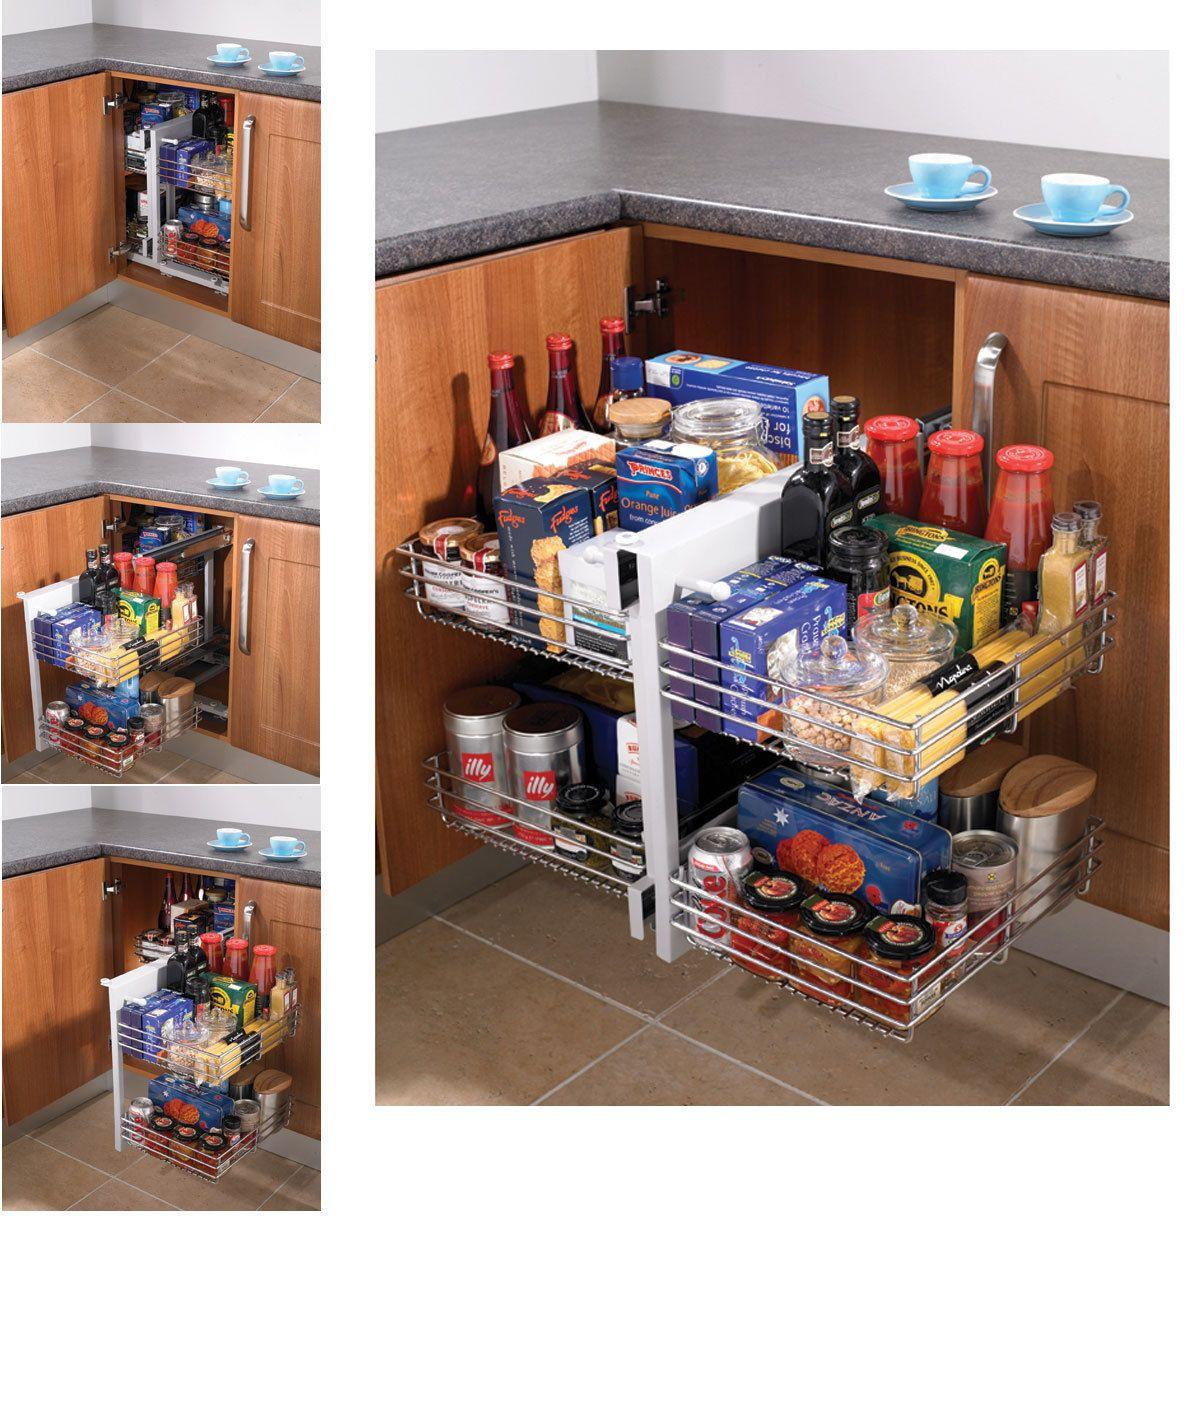 Blind Corner Optimiser Magic Corner Storage For 800 1000mm Kitchen Cabinets Ebay Corner Kitchen Cabinet Blind Corner Cabinet Cabinet Organization